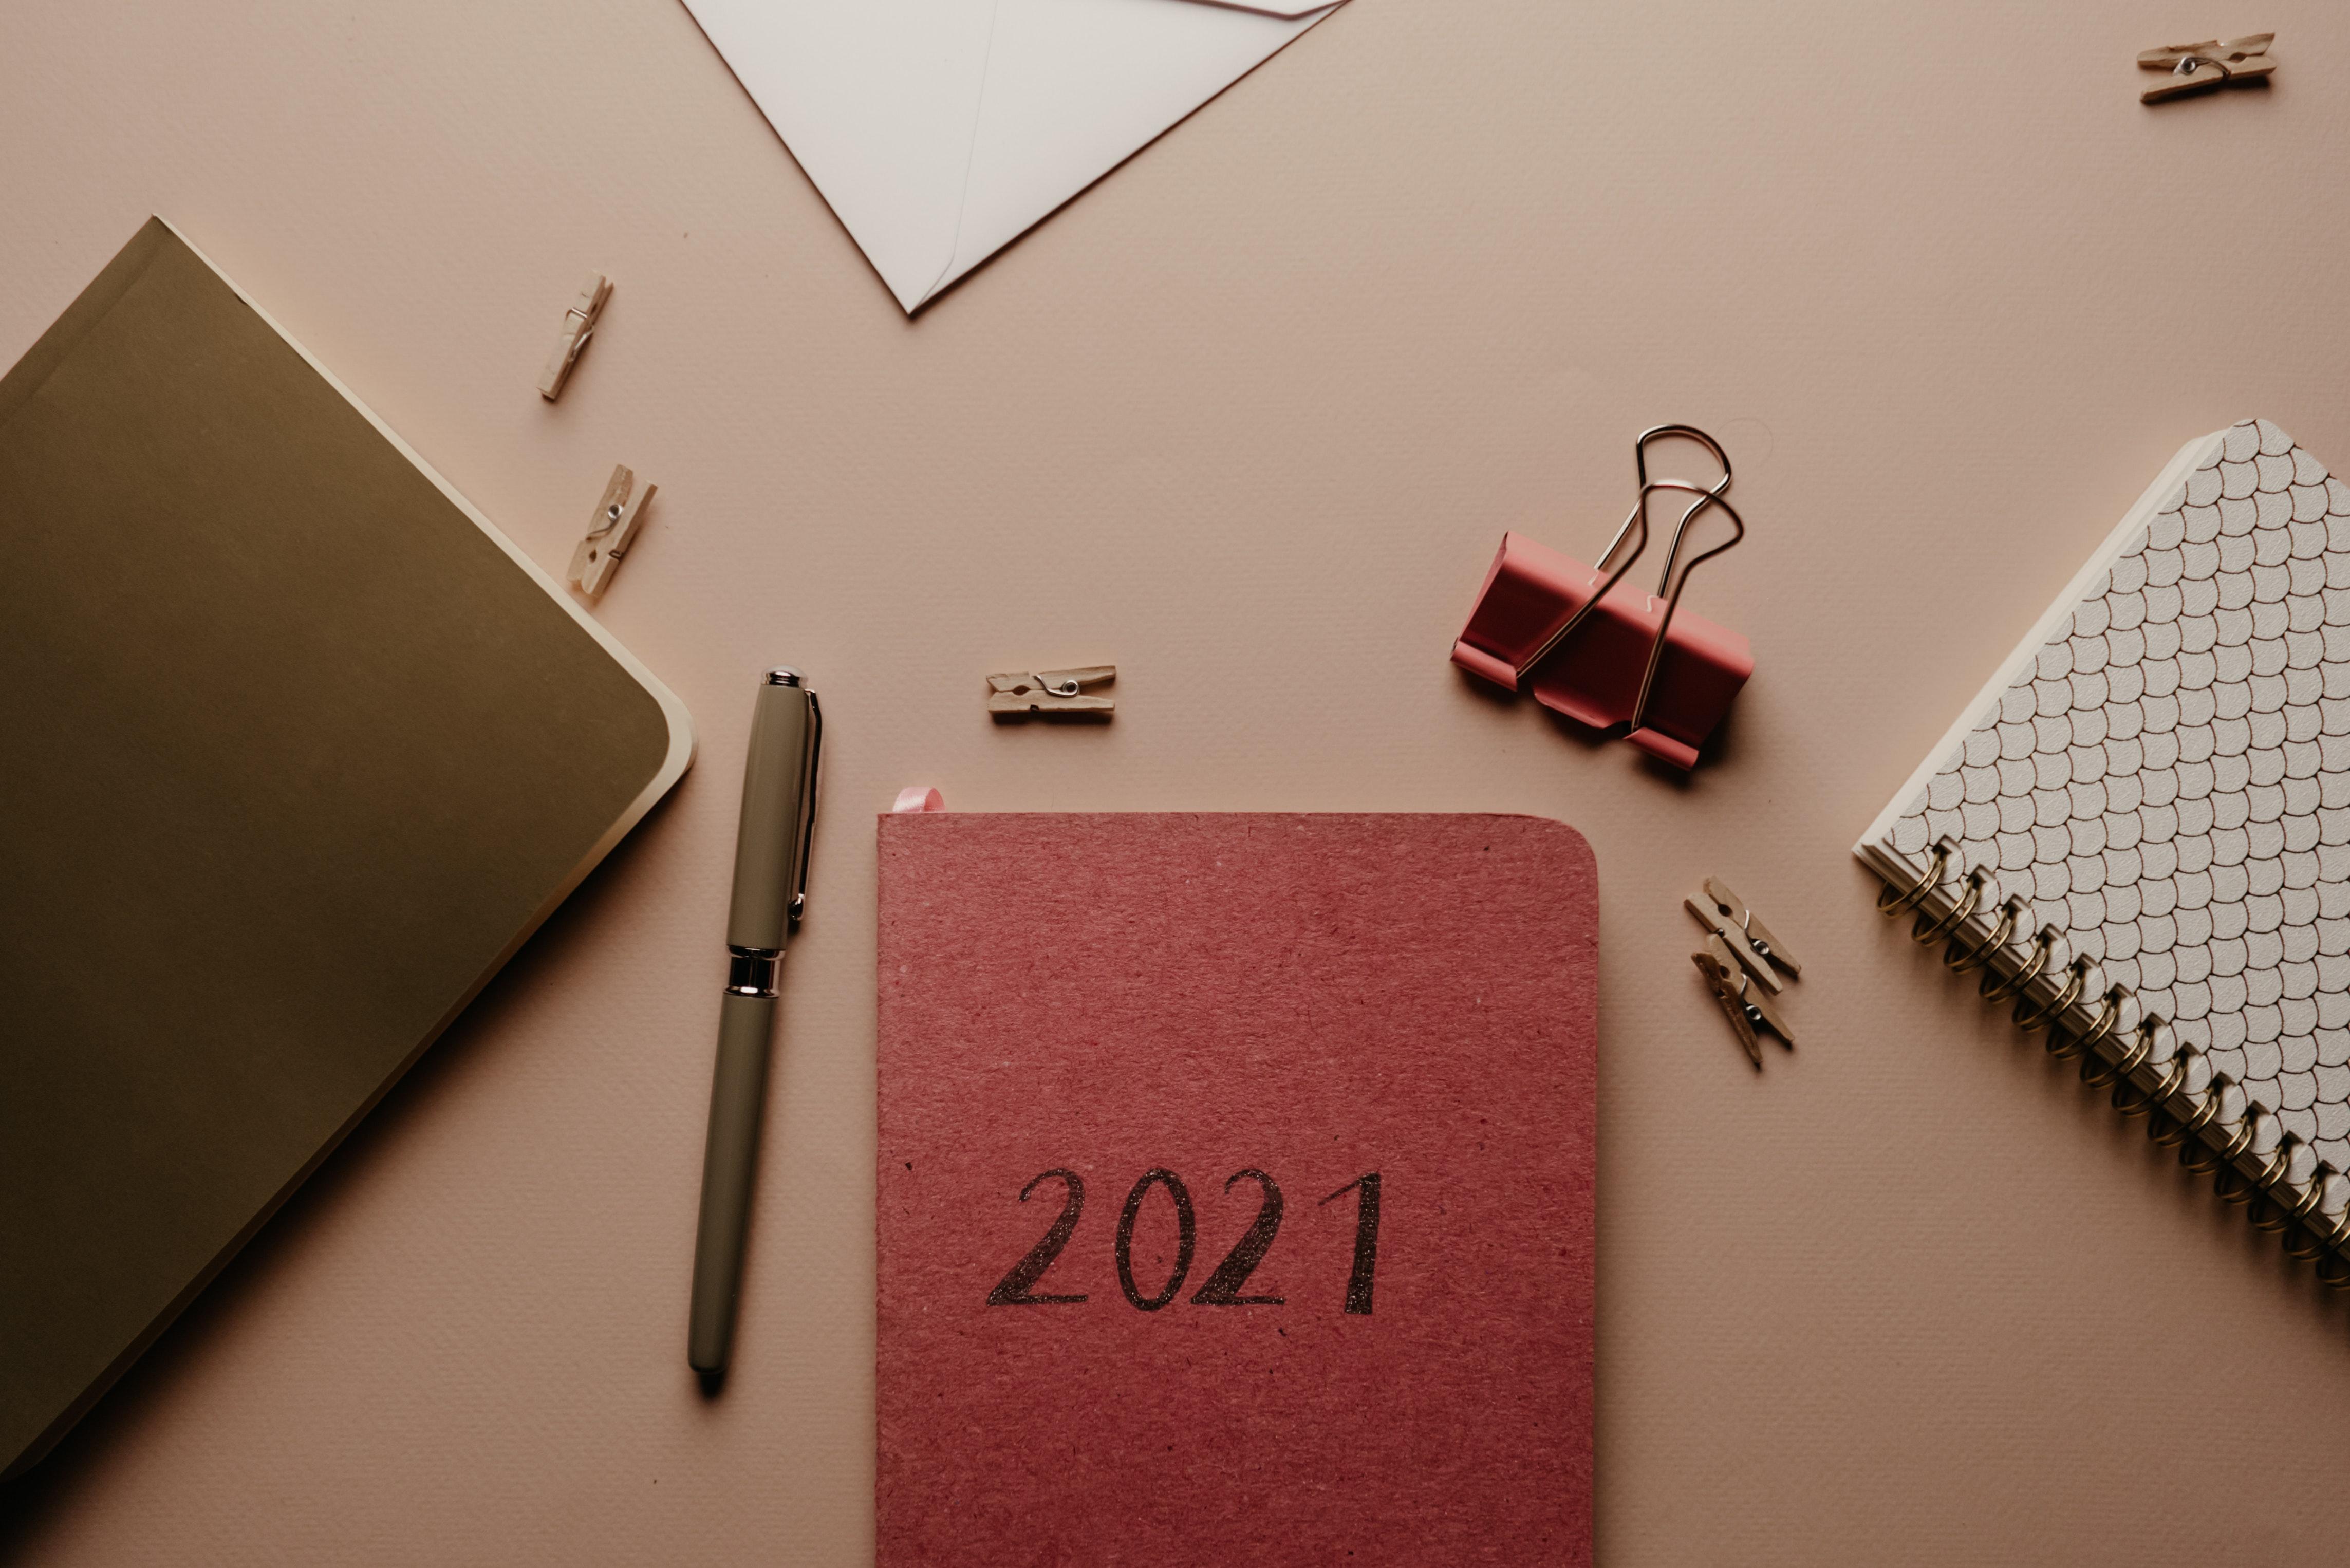 jyotish 2021